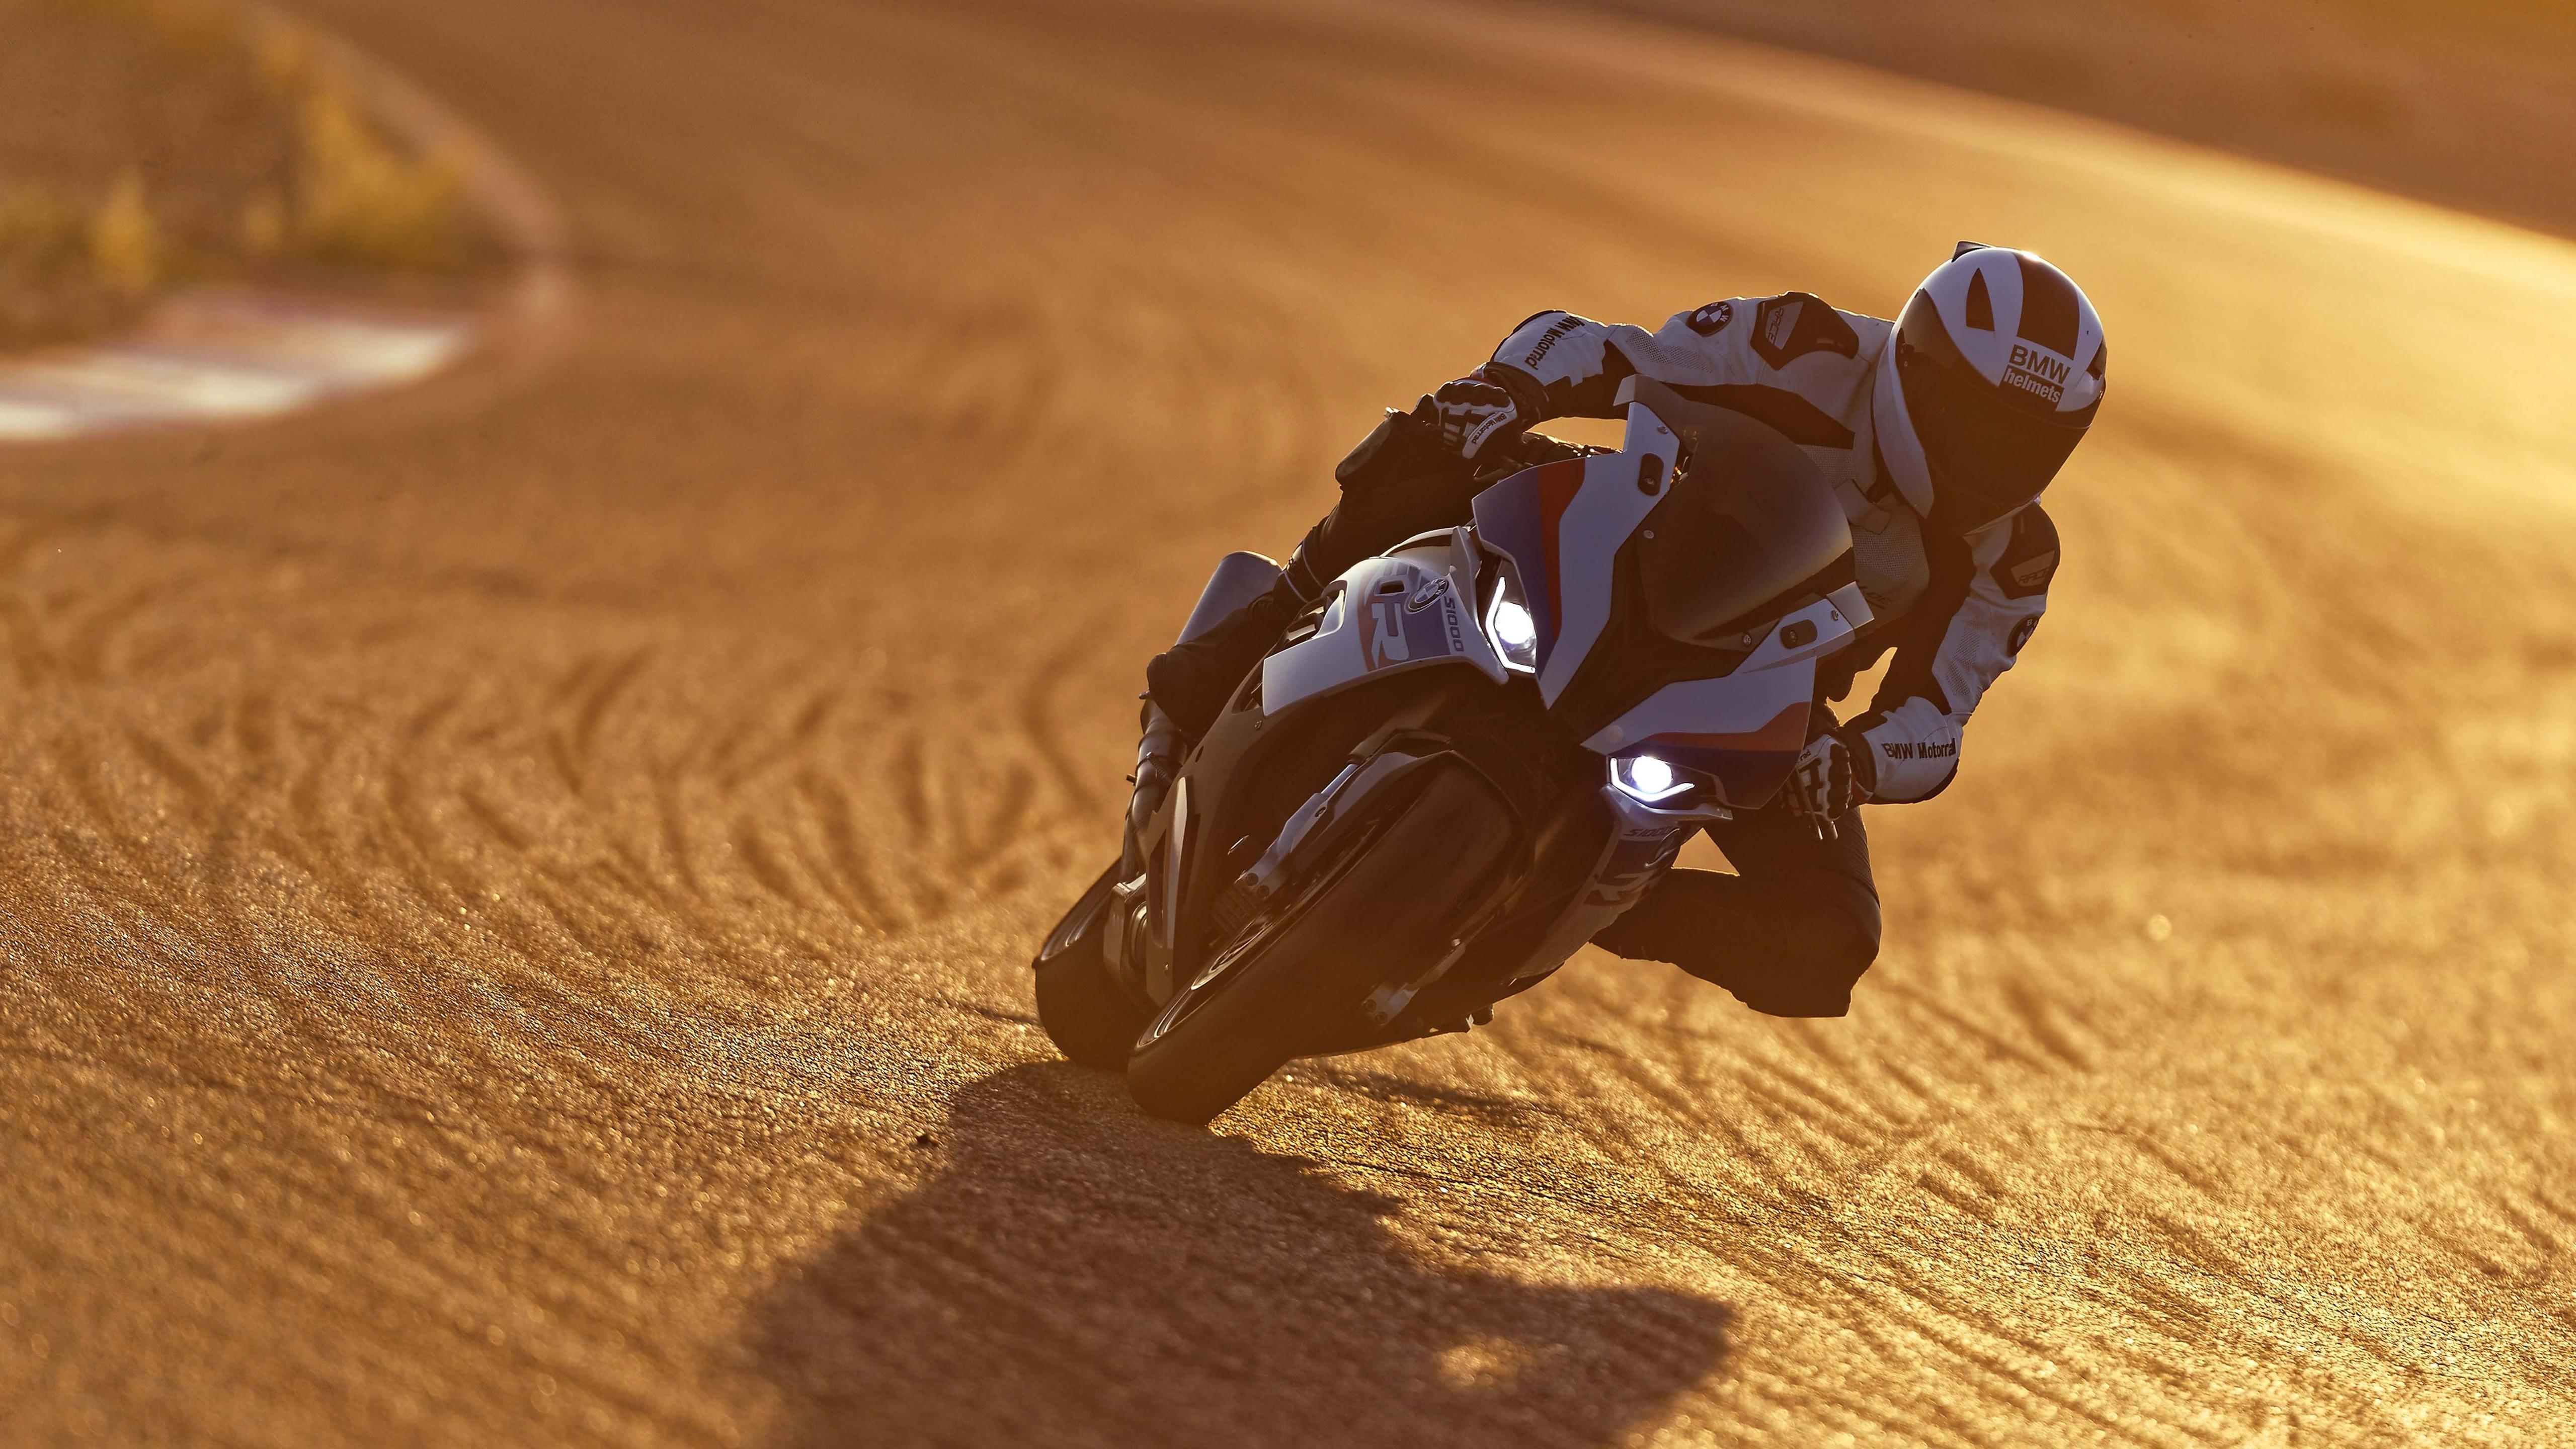 2019 KTM 690 Enduro R 4K Wallpapers